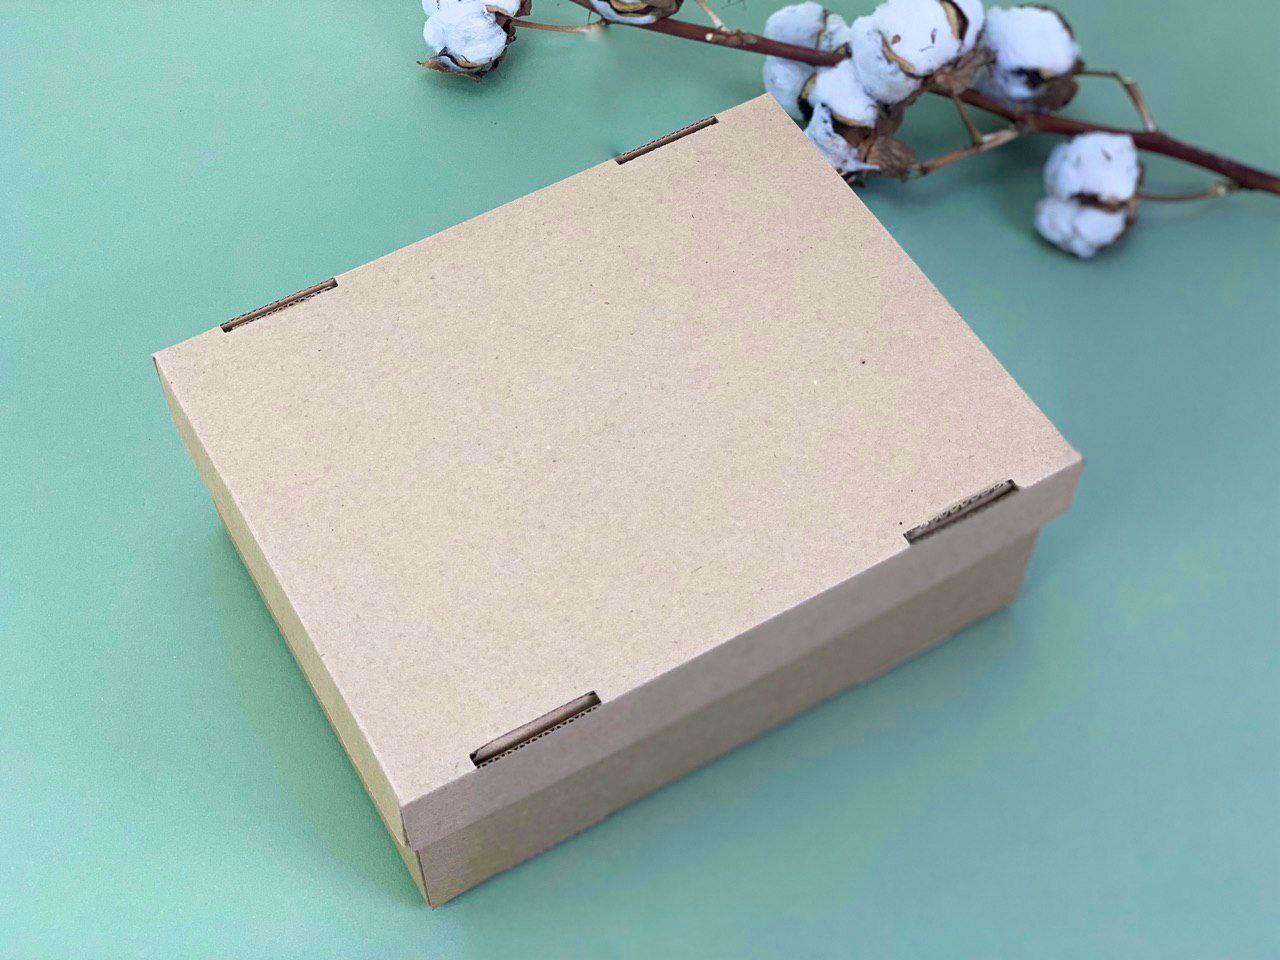 Коробка из микрогофрокартона. Размер: 23*17*9